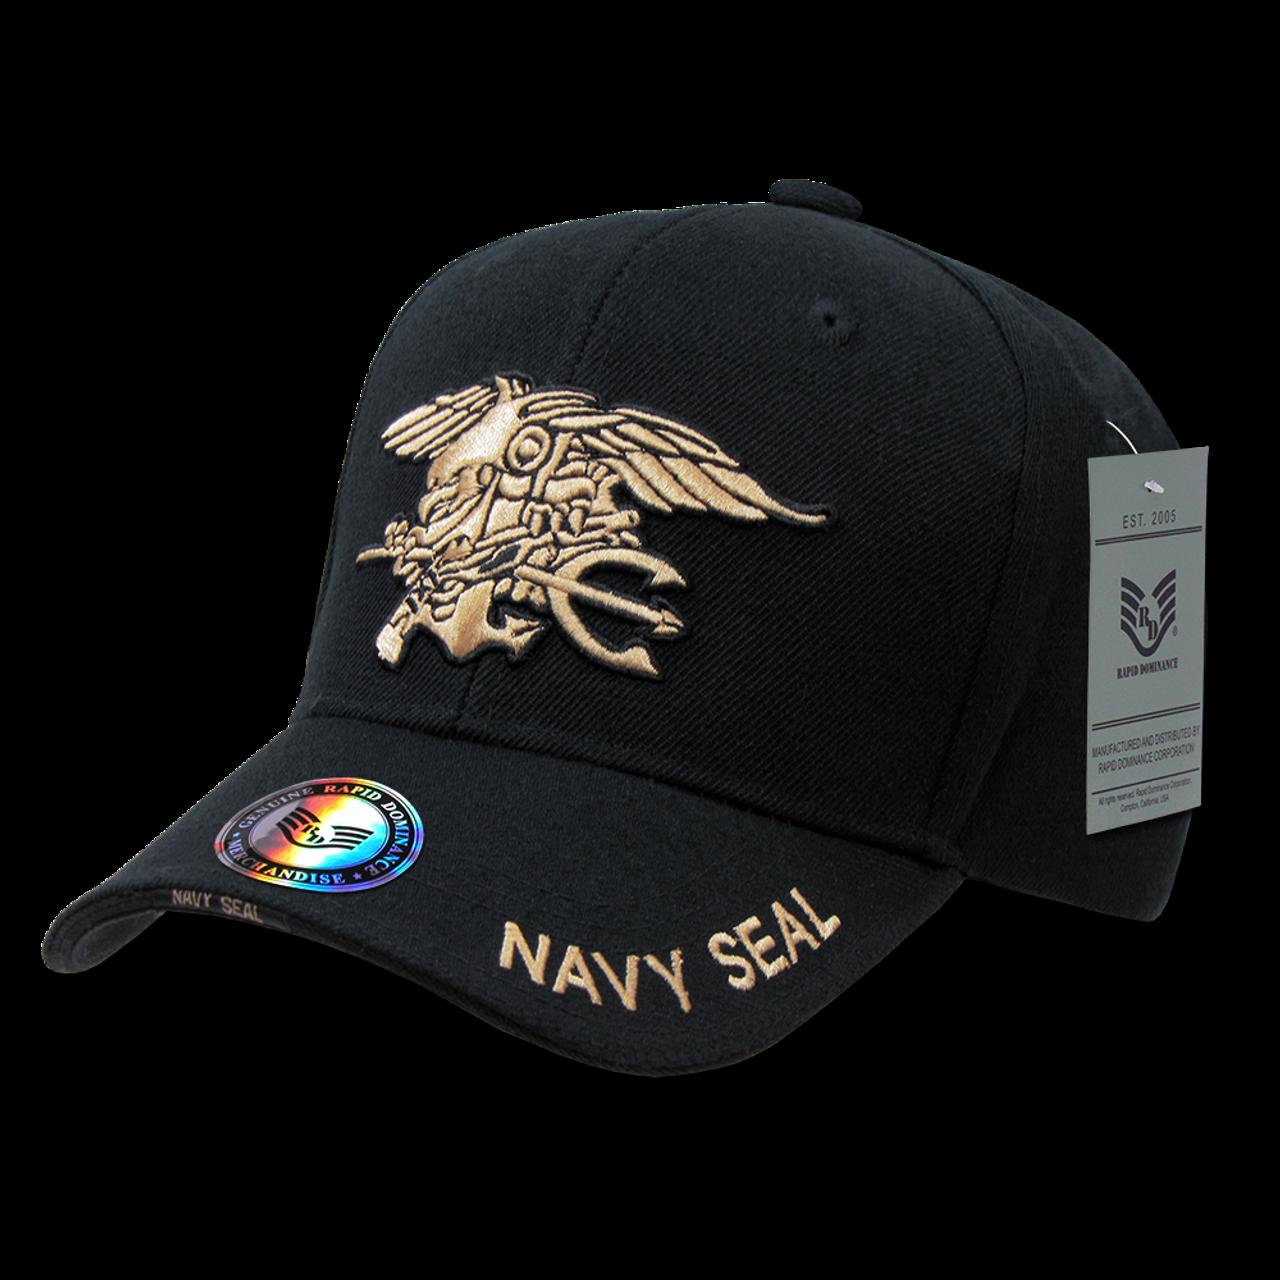 S001 - Navy SEAL Cap - Trident Eagle Anchor - Black